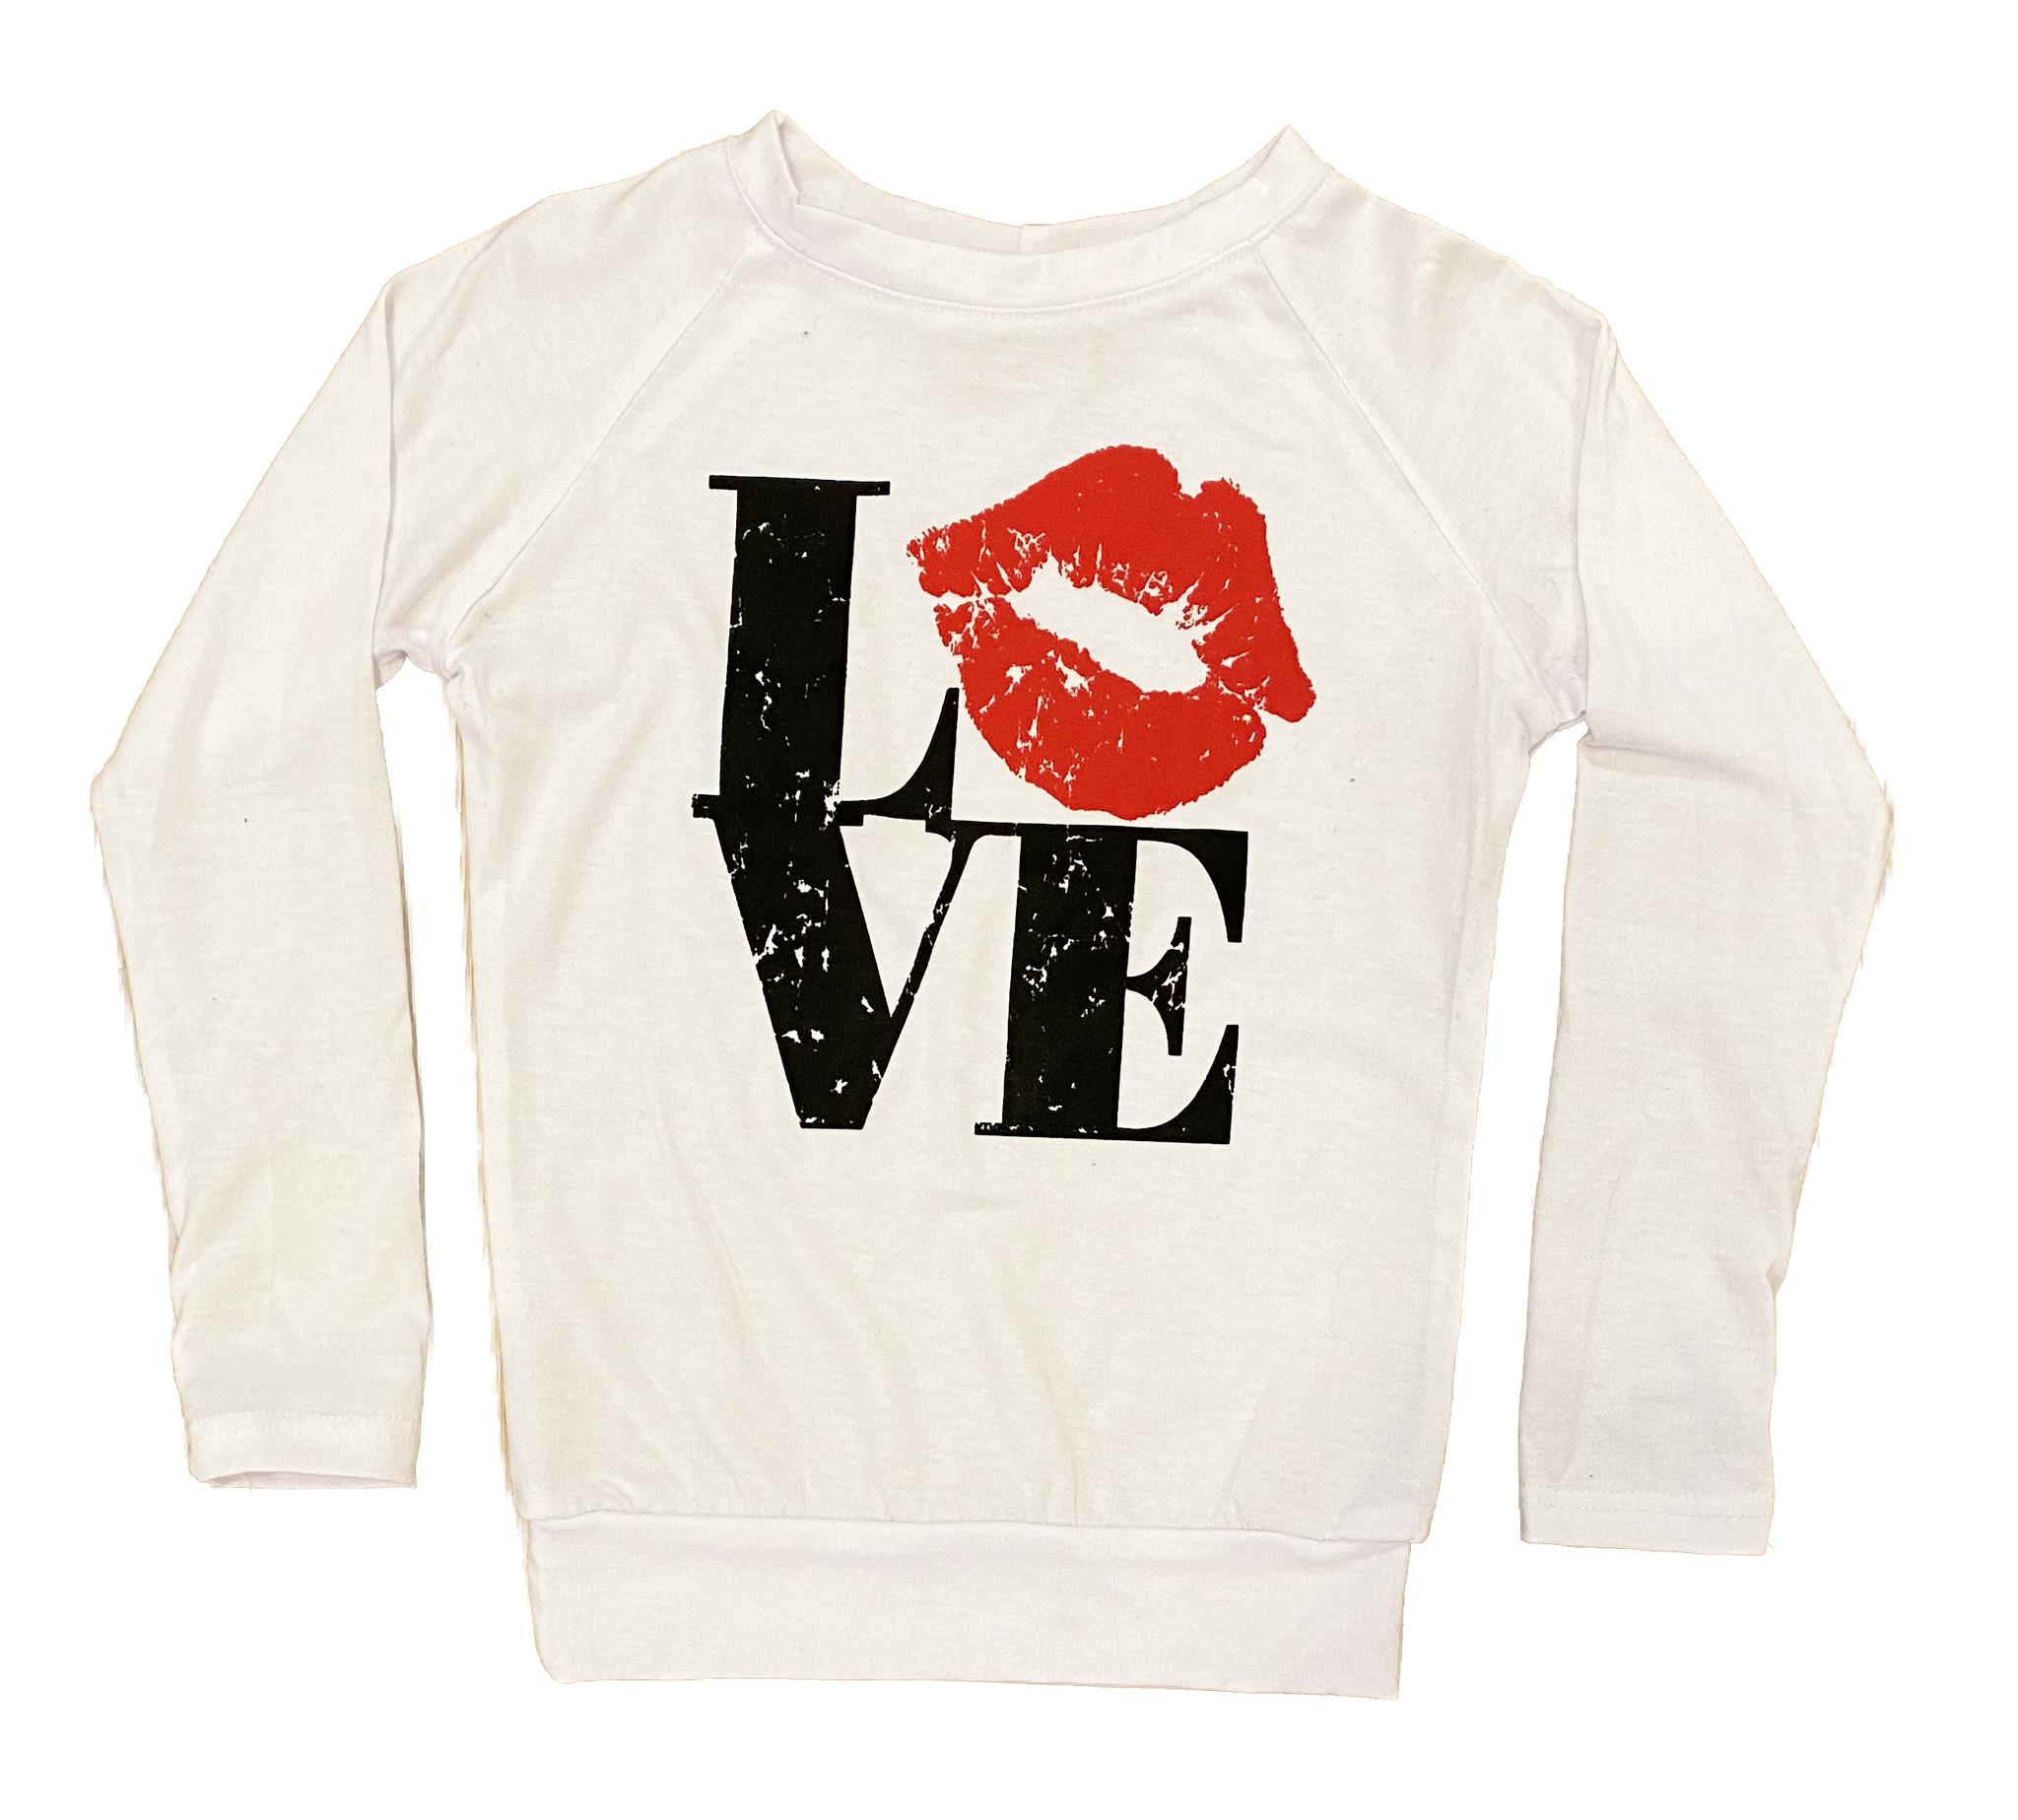 Love with Lips Raglan LS Tee